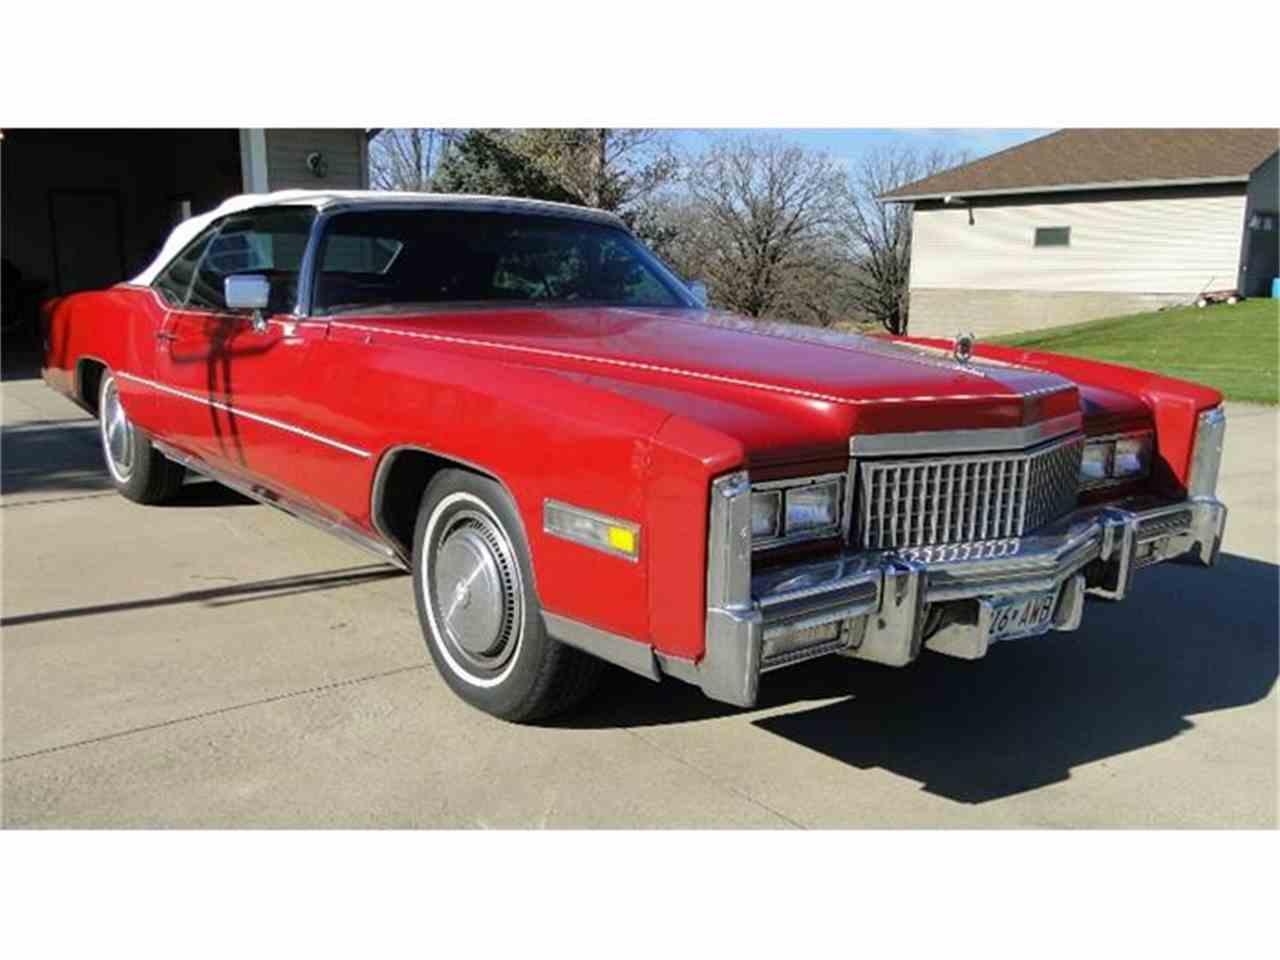 Large Picture of '75 Cadillac Eldorado - $9,500.00 - CXH4